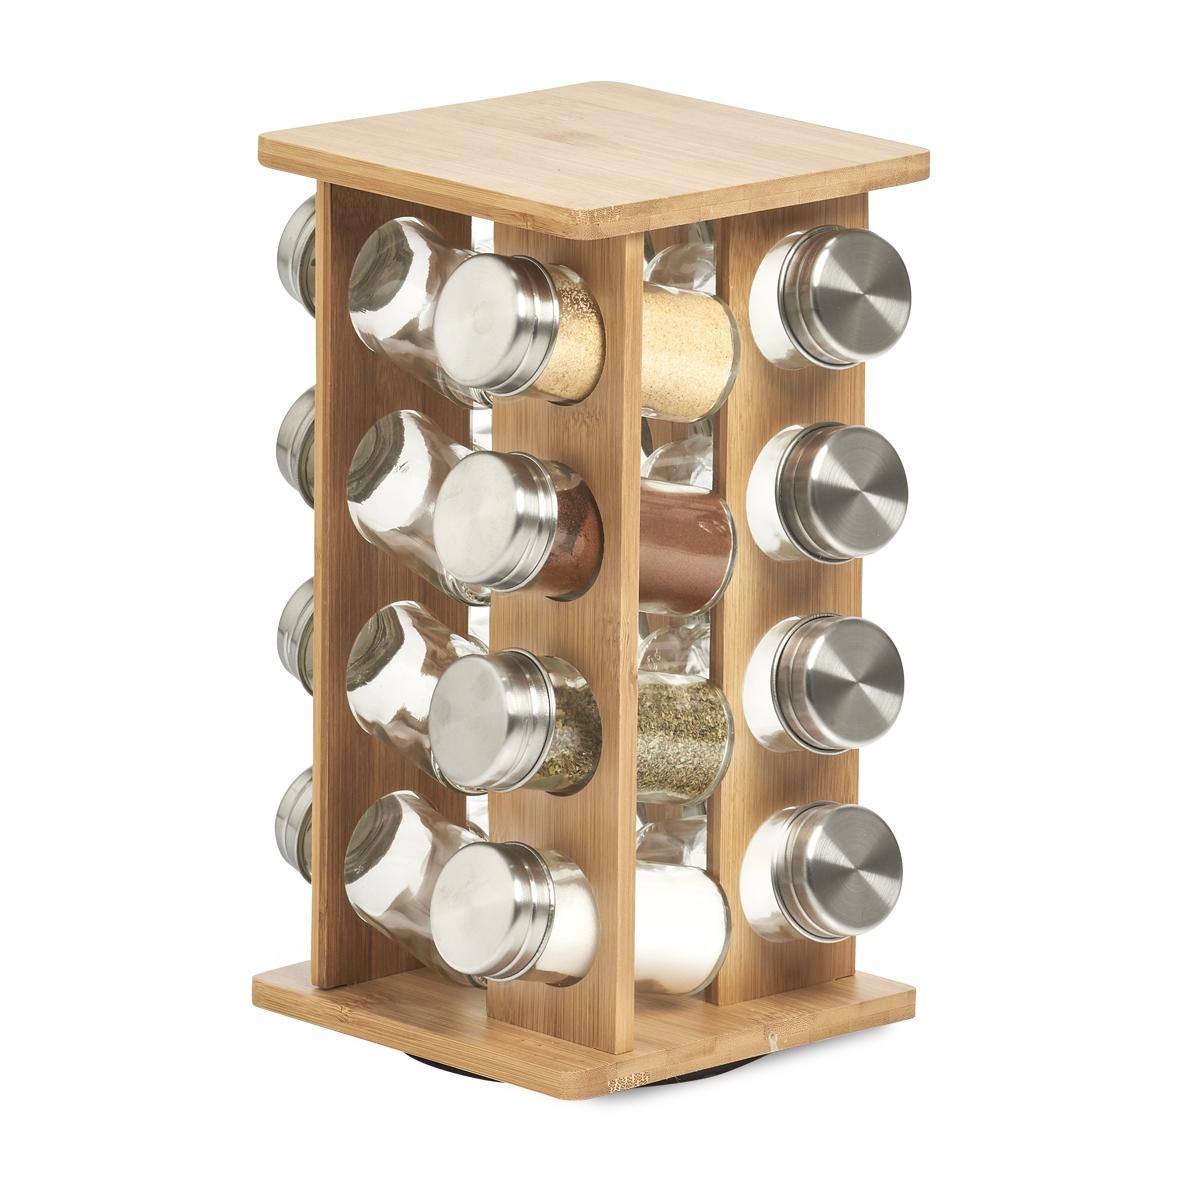 Set recipiente pentru depozitare condimente, cu suport din bambus, Bamboo Natural, 17 piese imagine